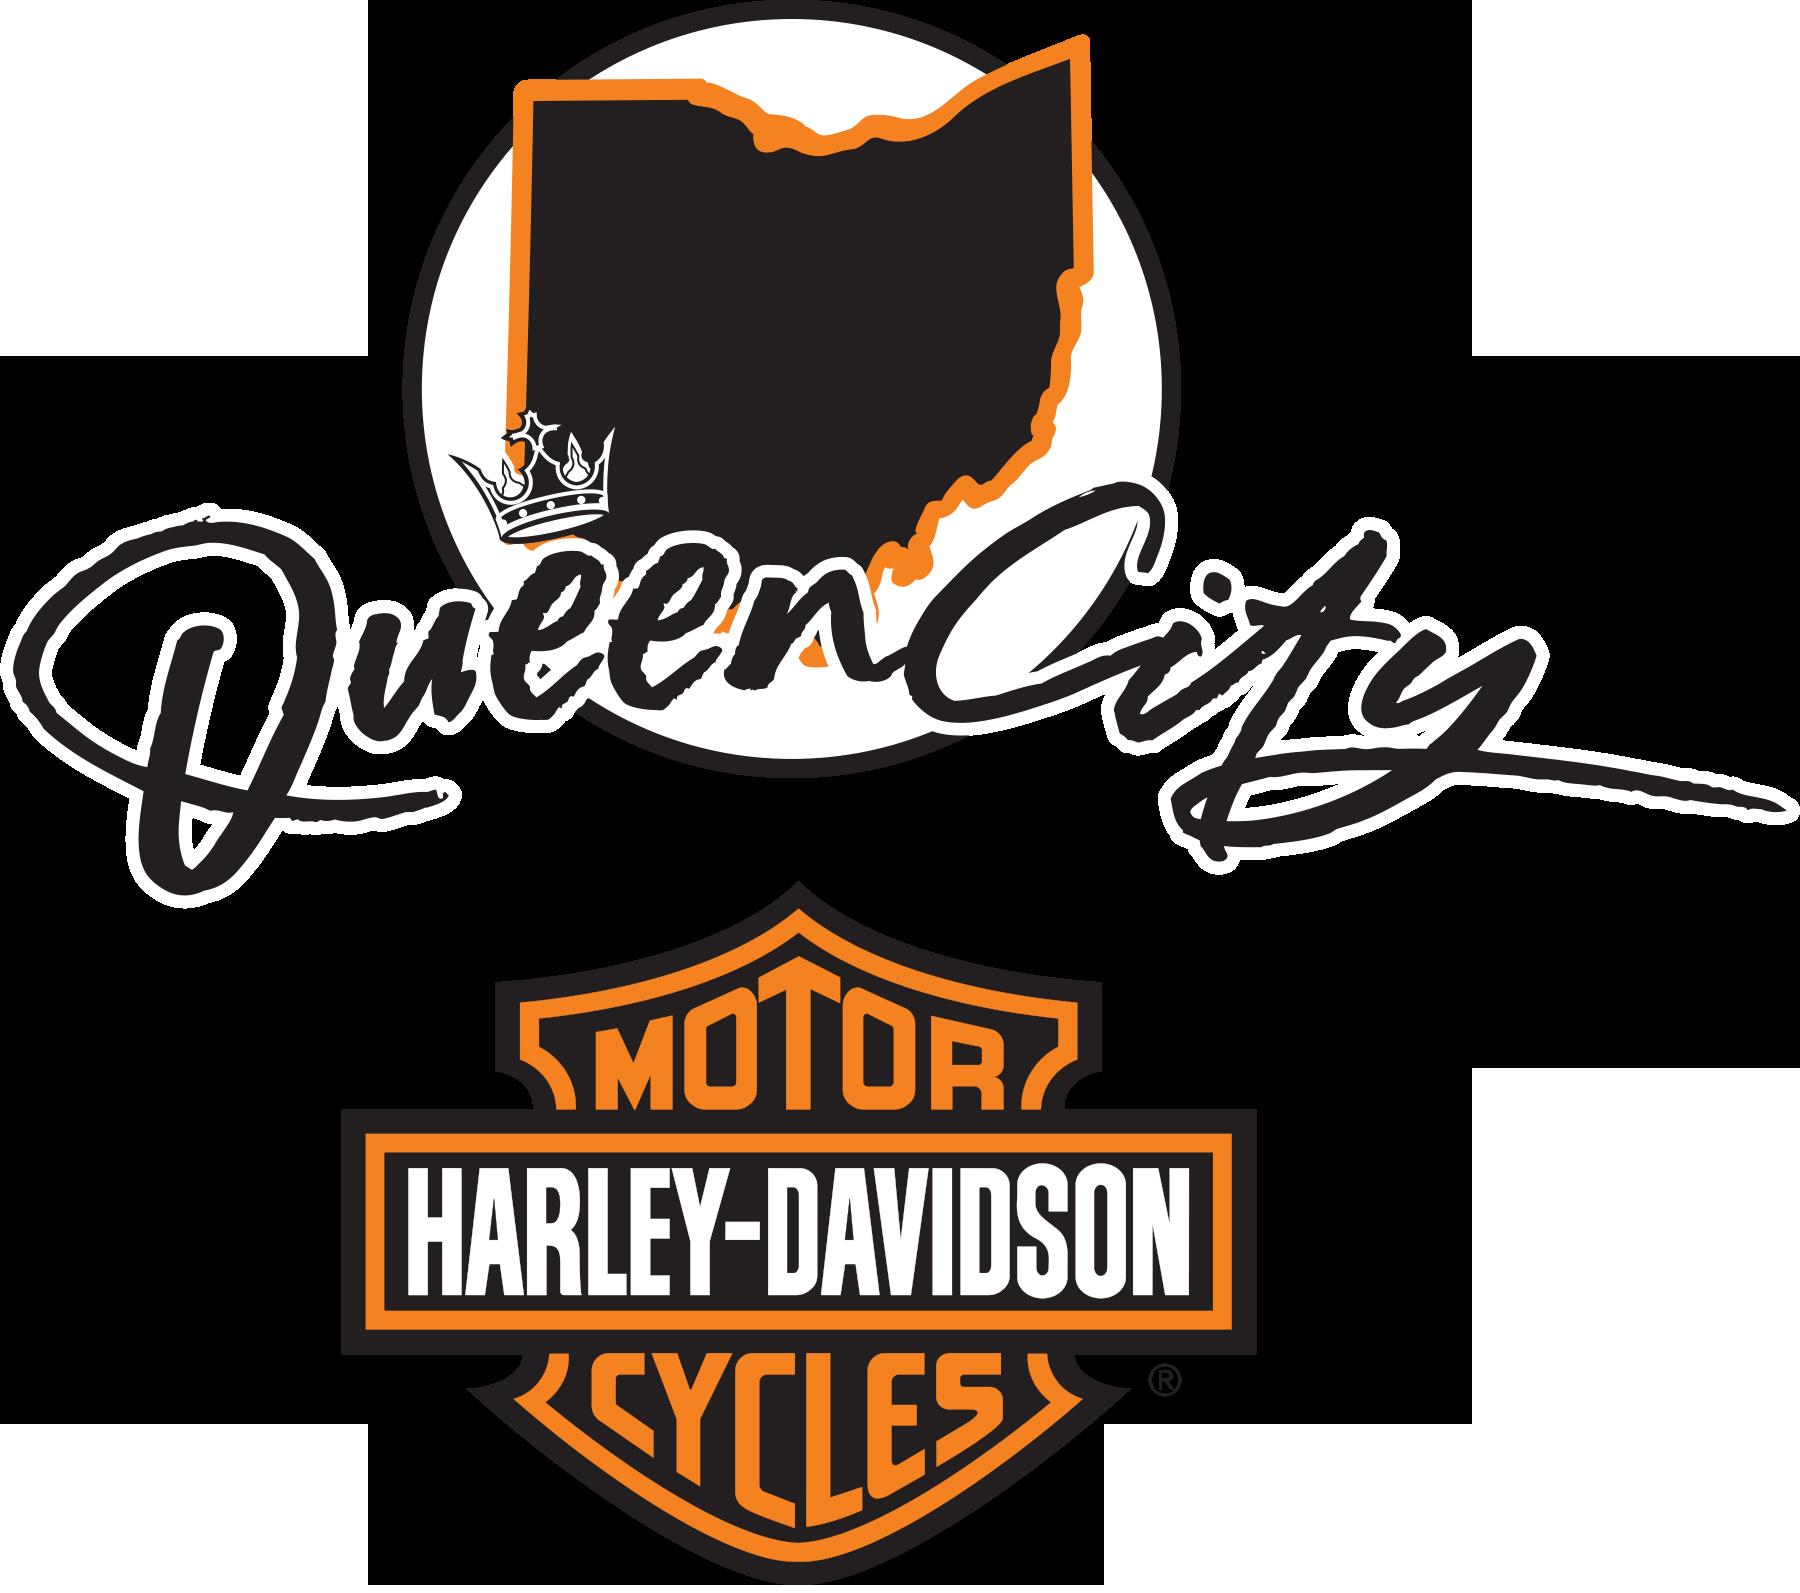 Queen City Harley-Davidson